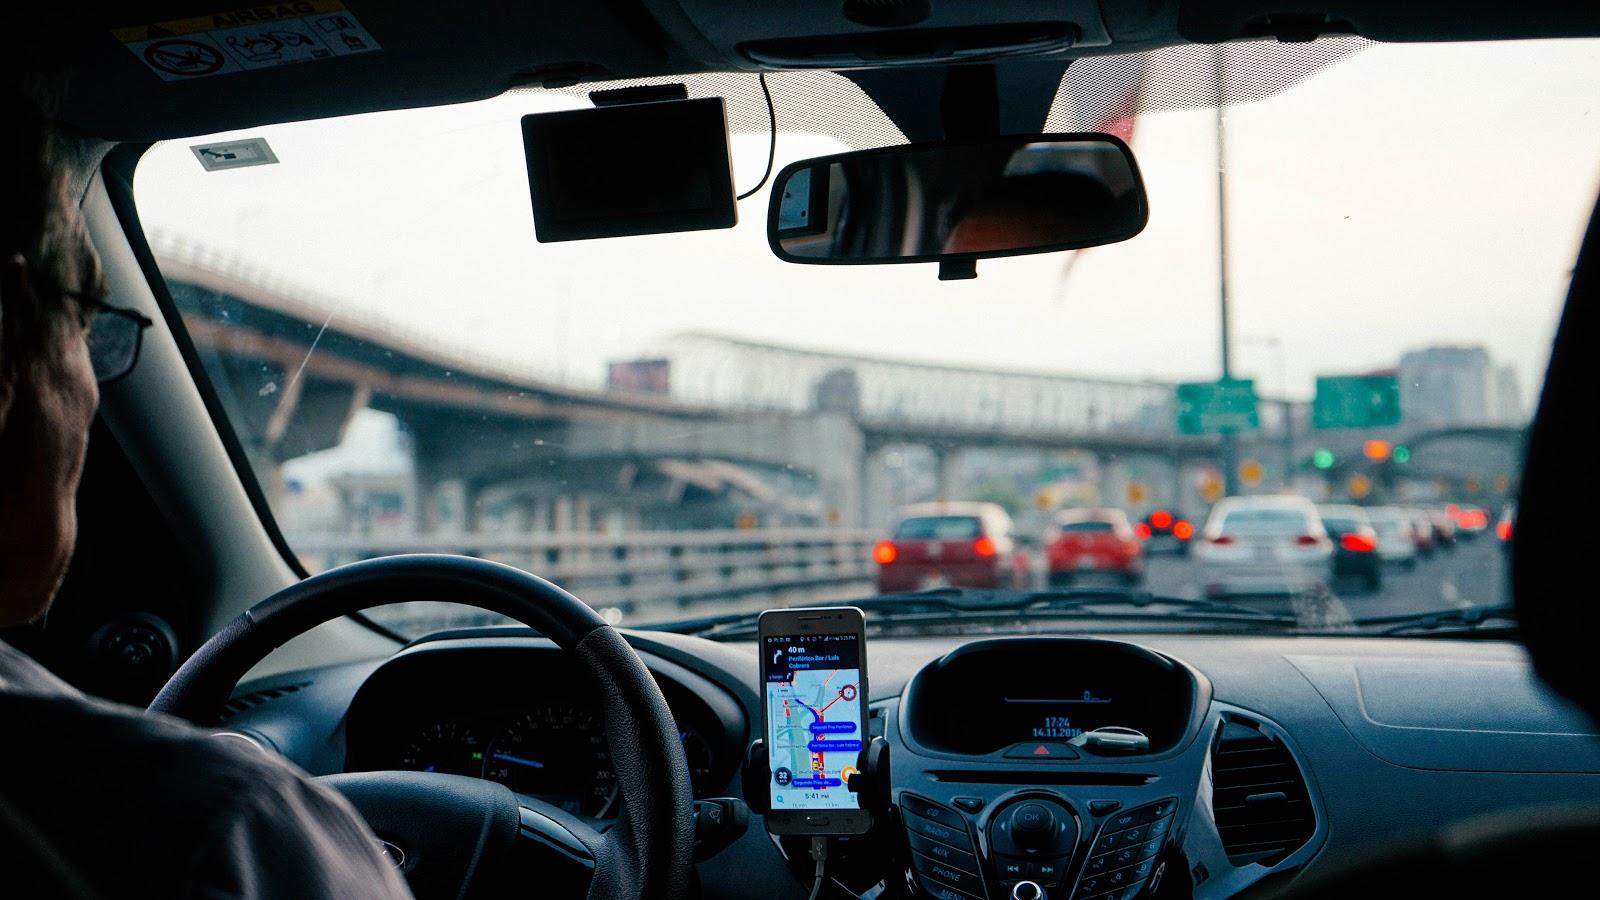 economia compartilhada, Uber, Lyft, 99/Didi e similares